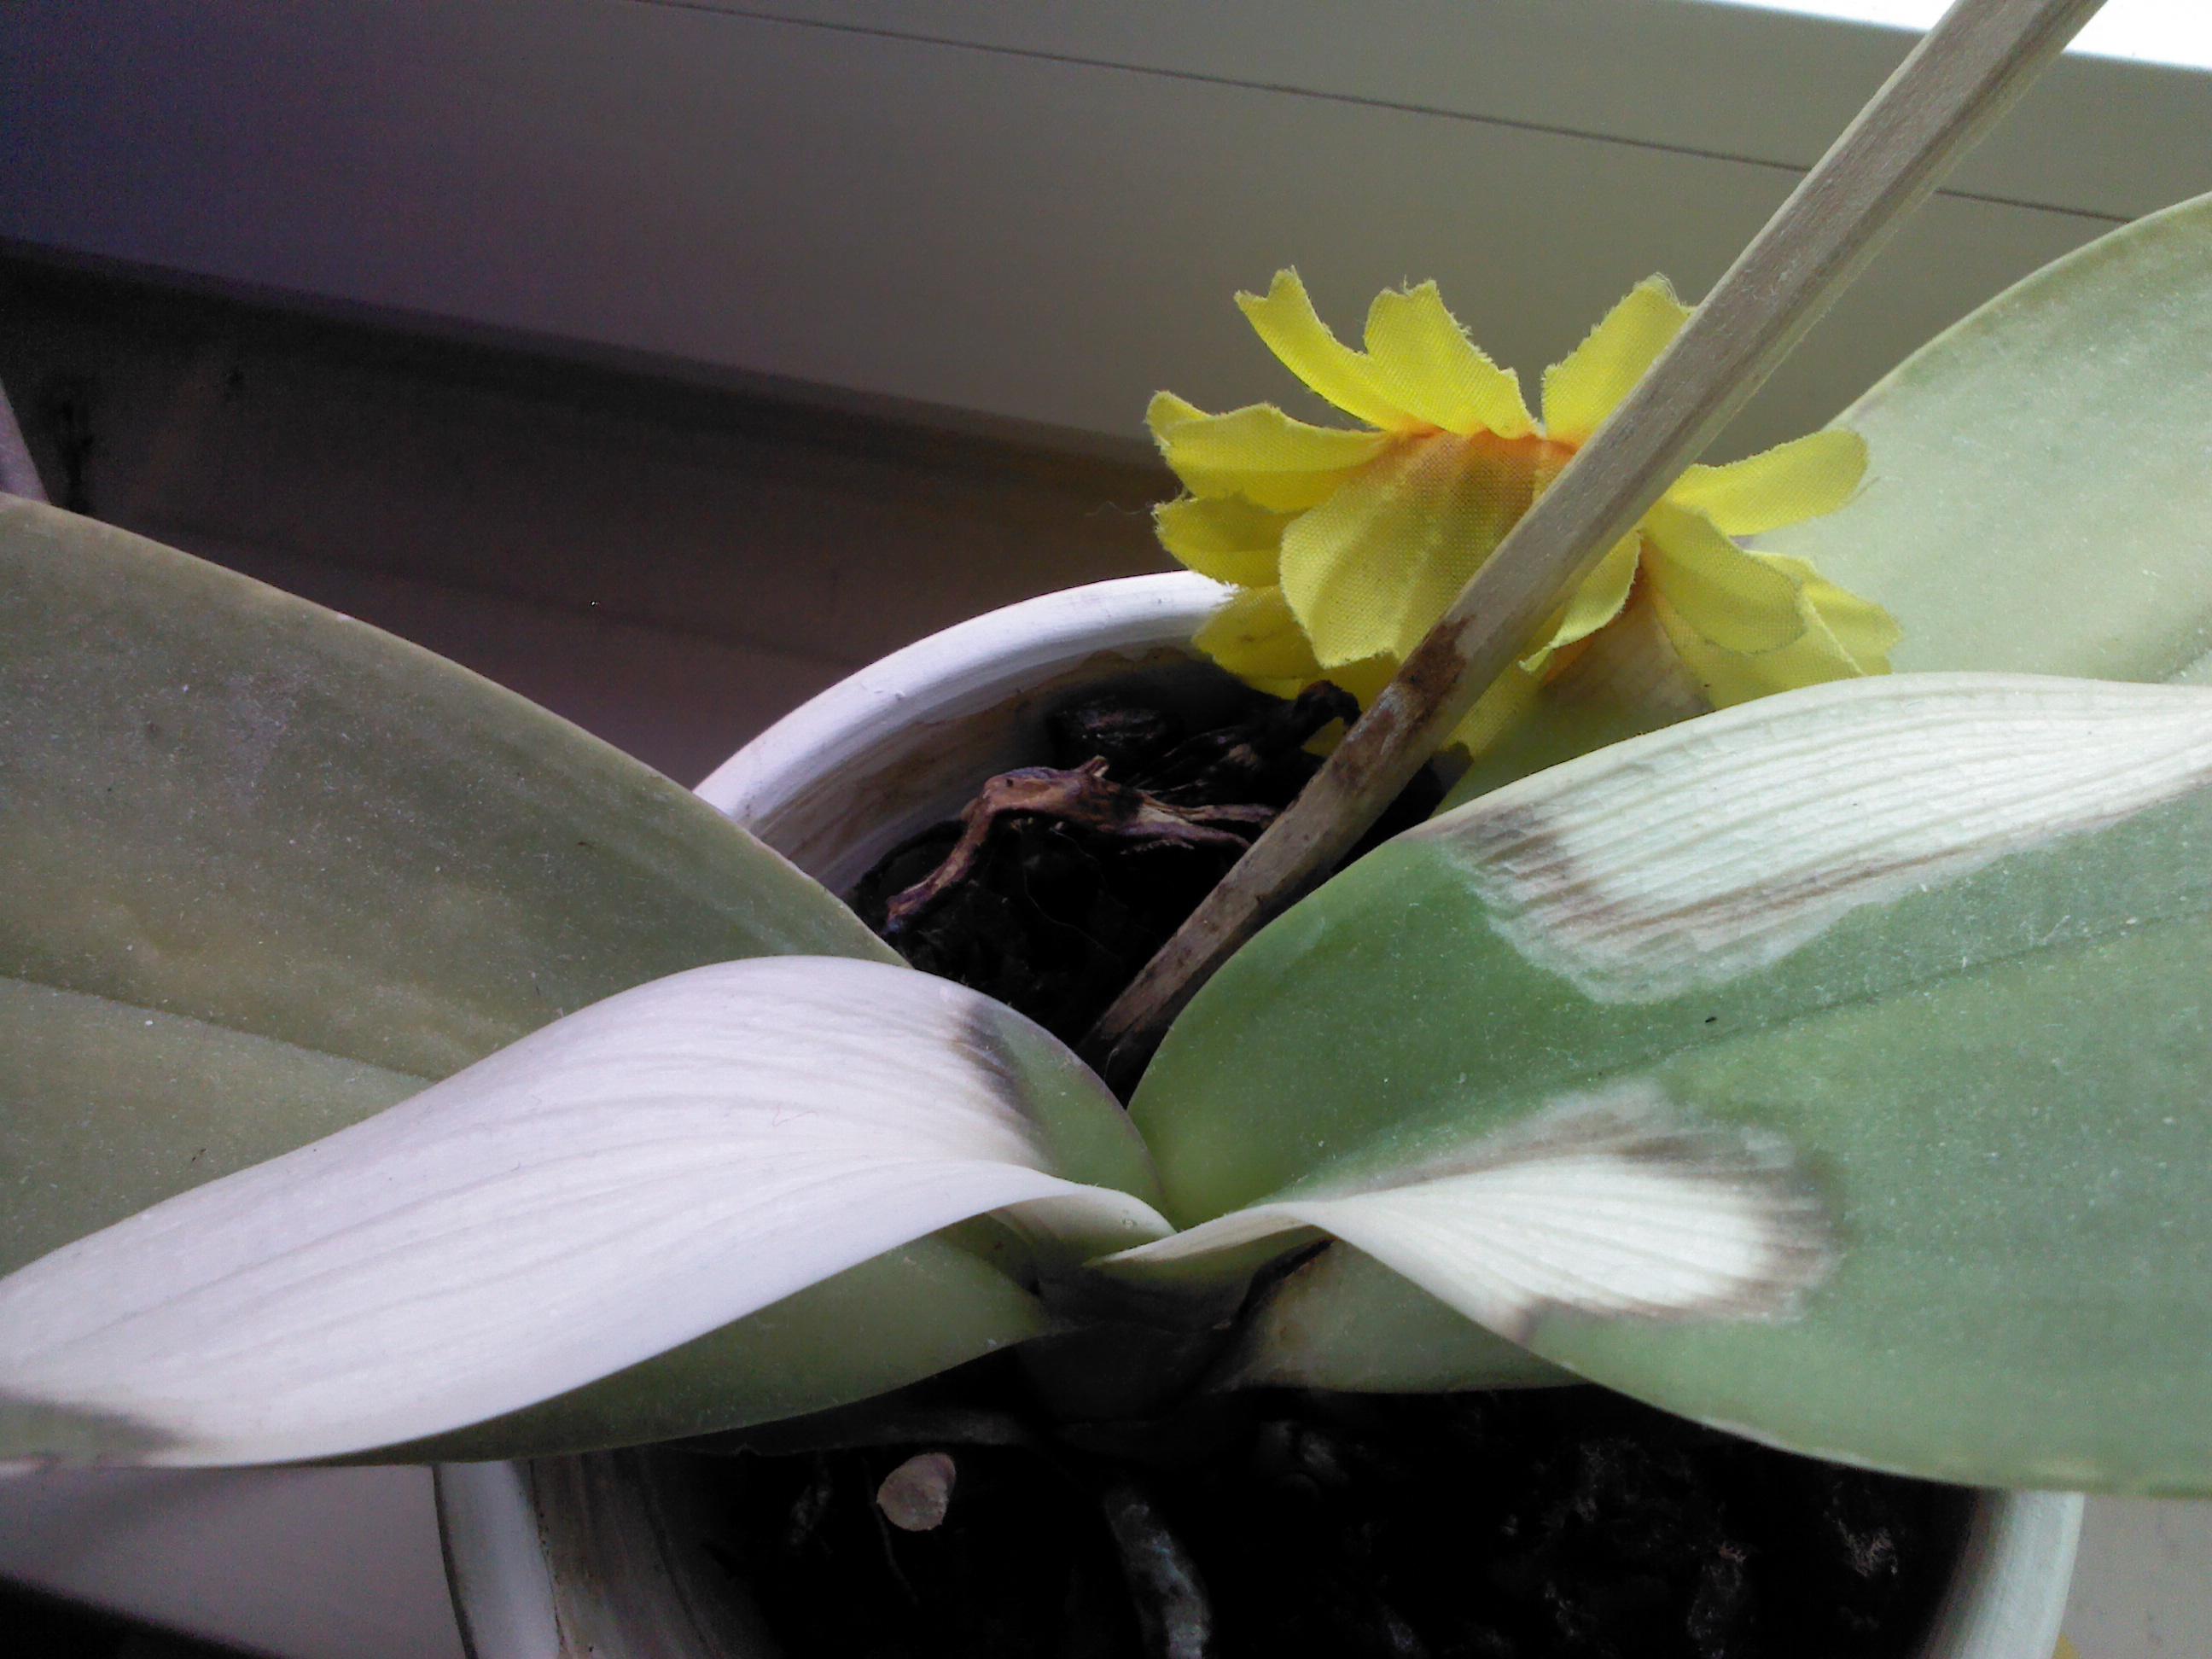 orchidee bekommt gelbe bl tter pflanzen orchideen. Black Bedroom Furniture Sets. Home Design Ideas